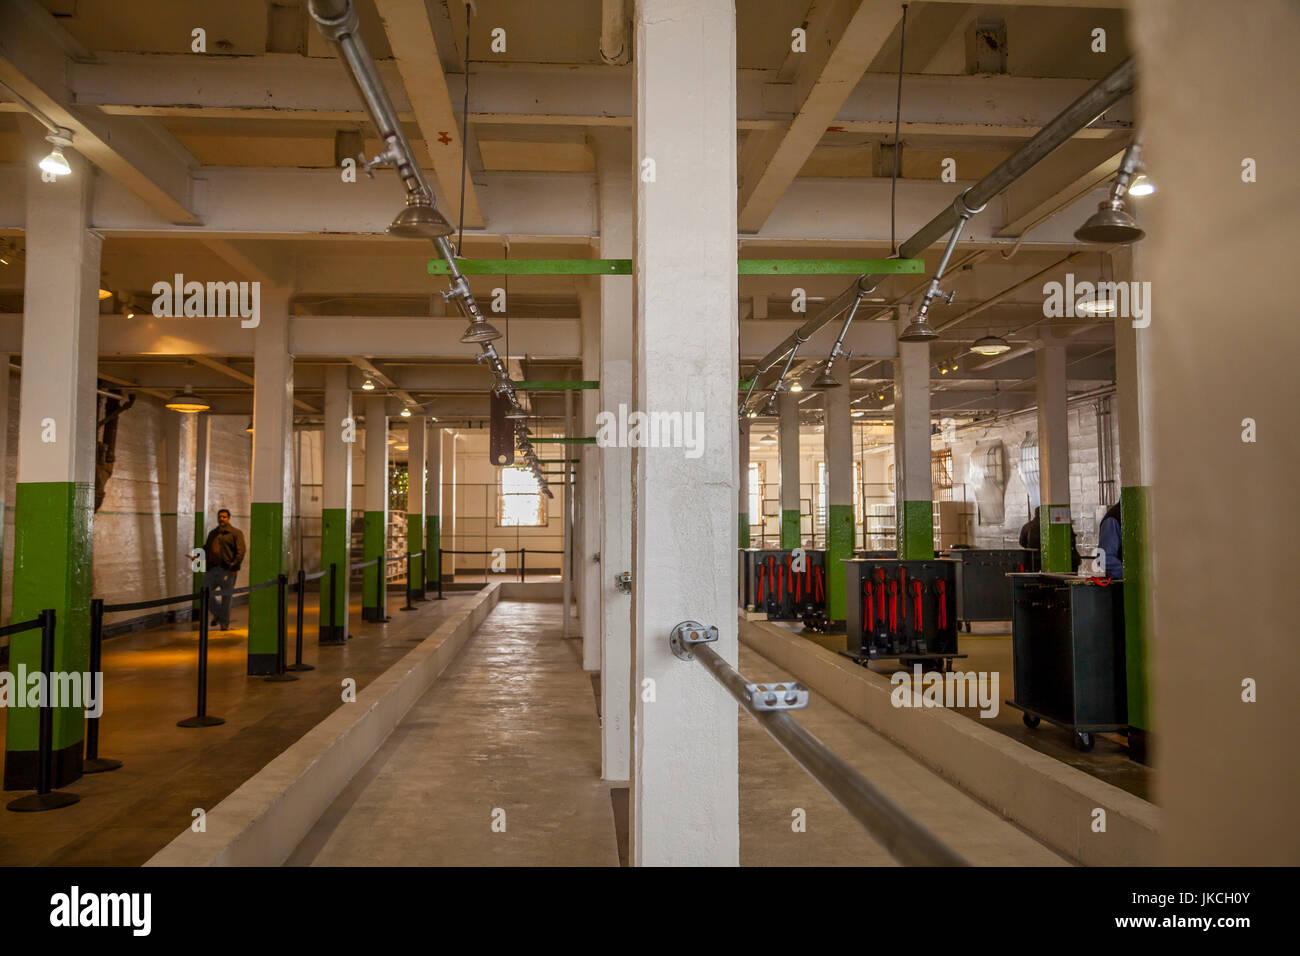 Shower area in Alcatraz penitentiary, San Francisco, California, USA - Stock Image